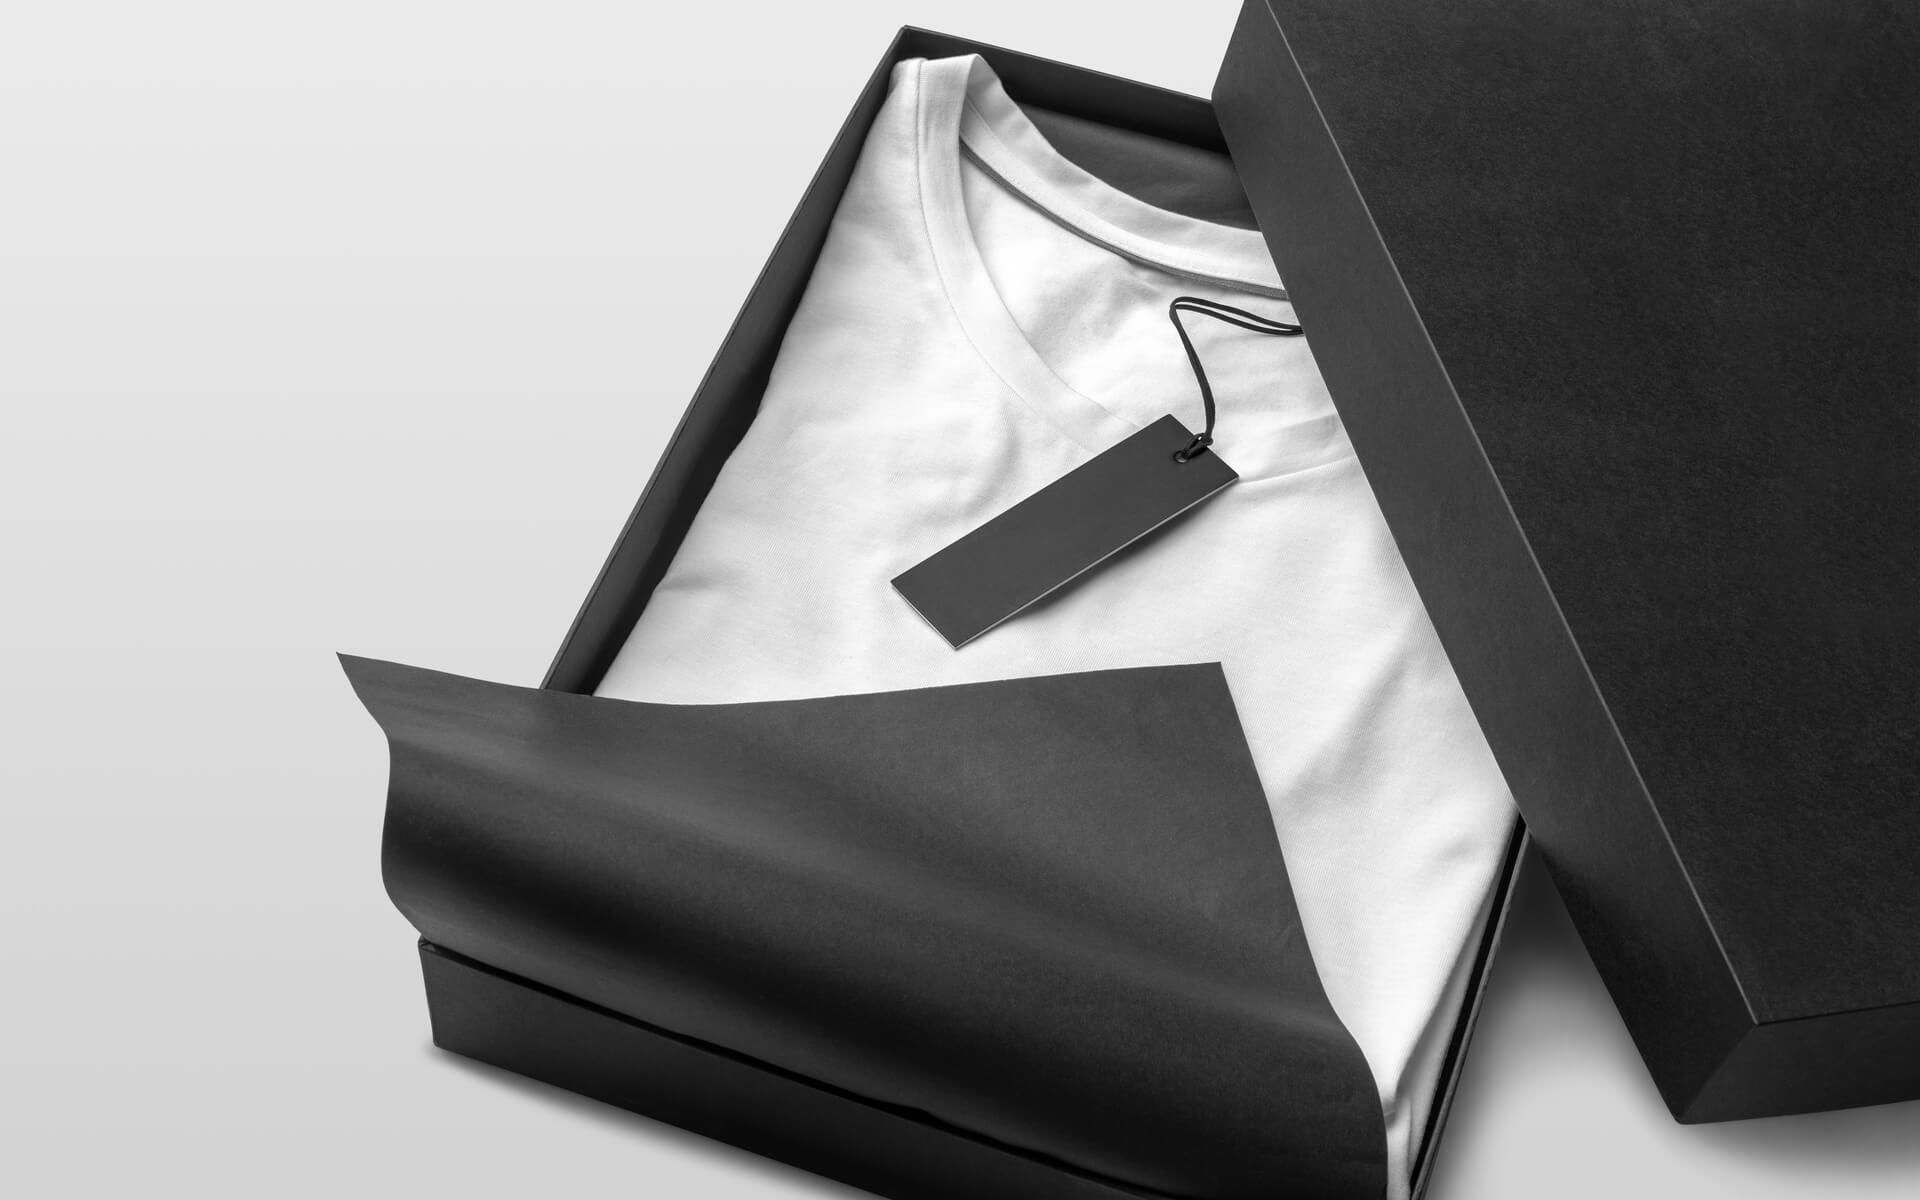 bg-shirt-packaging-brand-w1920h1200